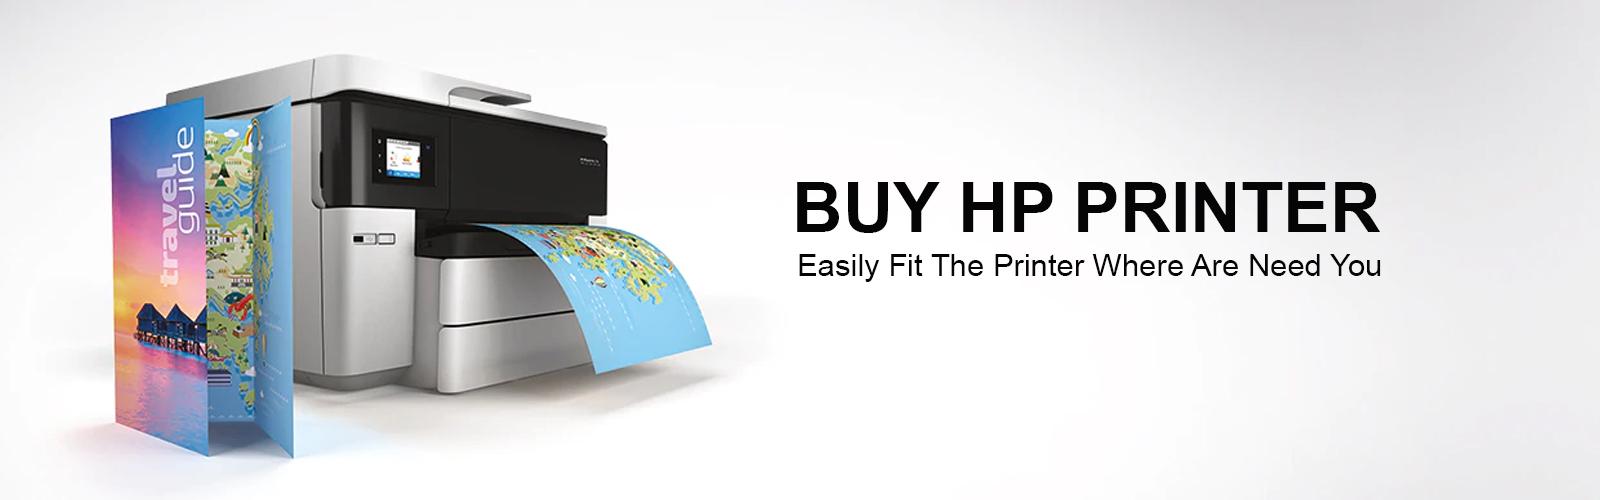 HP Printer Sale